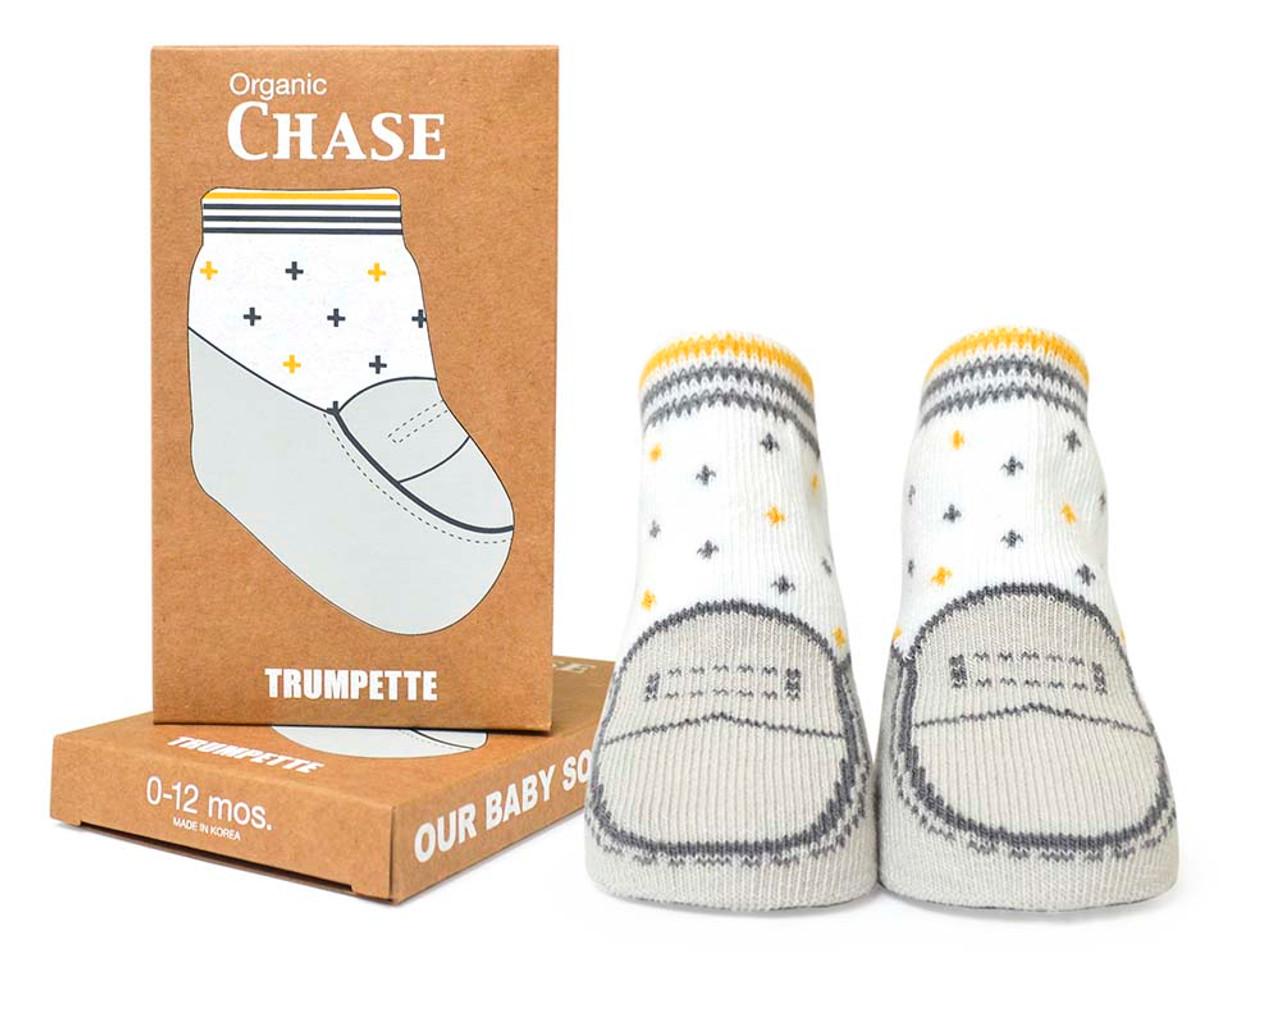 b0e645d83 Organic Chase Baby Socks